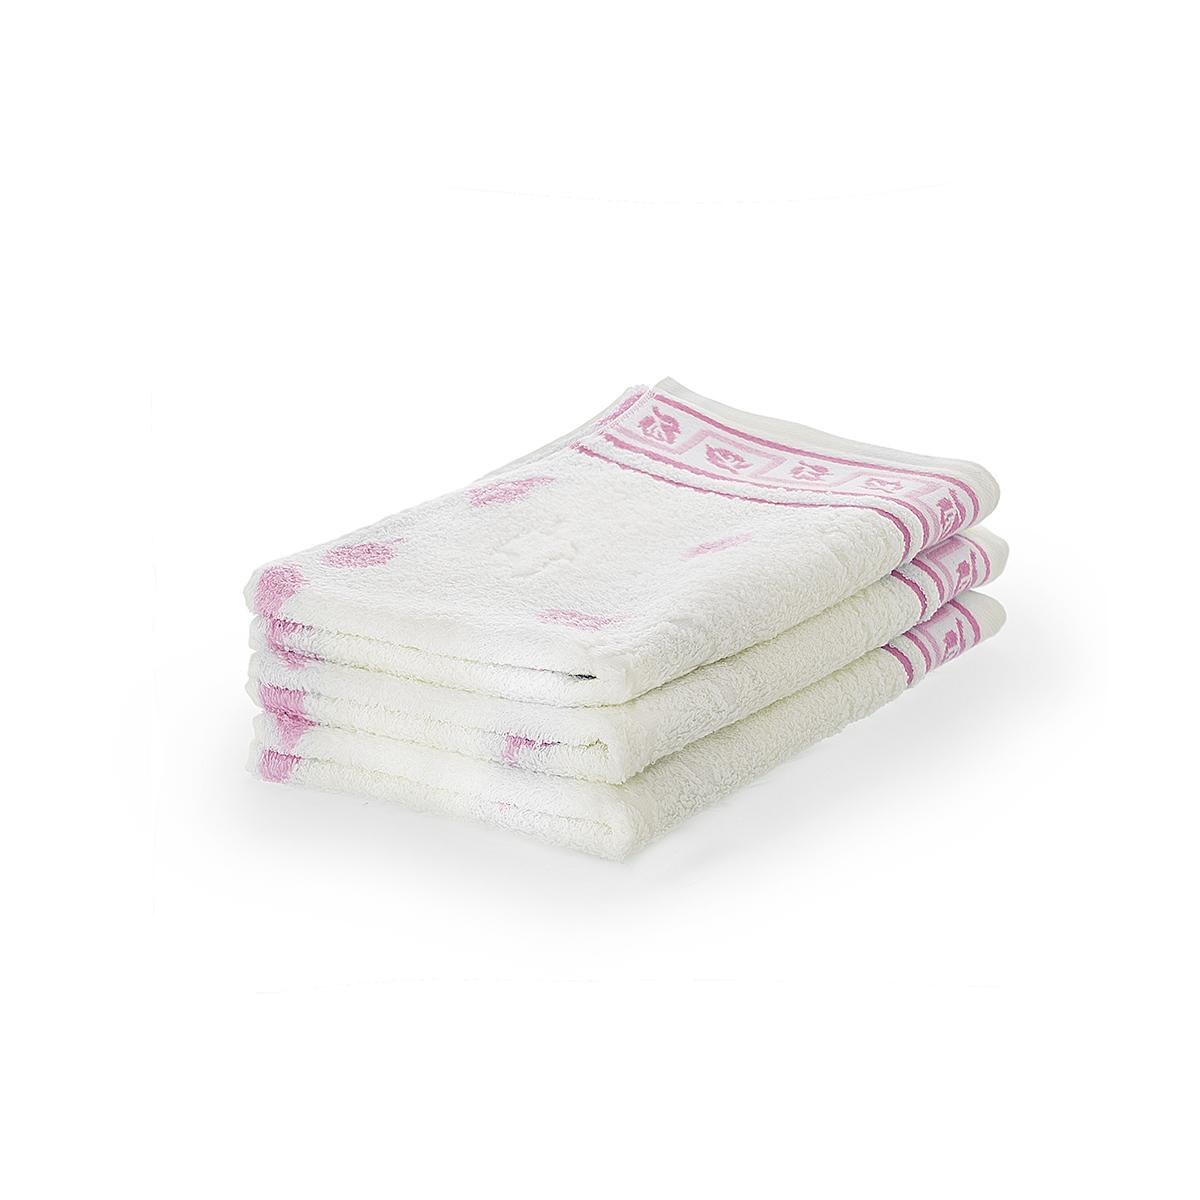 Полотенце Листопад Розовый, размер 50х90 смМахровые полотенца<br>Плотность ткани:480 г/кв. м.<br><br>Тип: Полотенце<br>Размер: 50х90<br>Материал: Махра